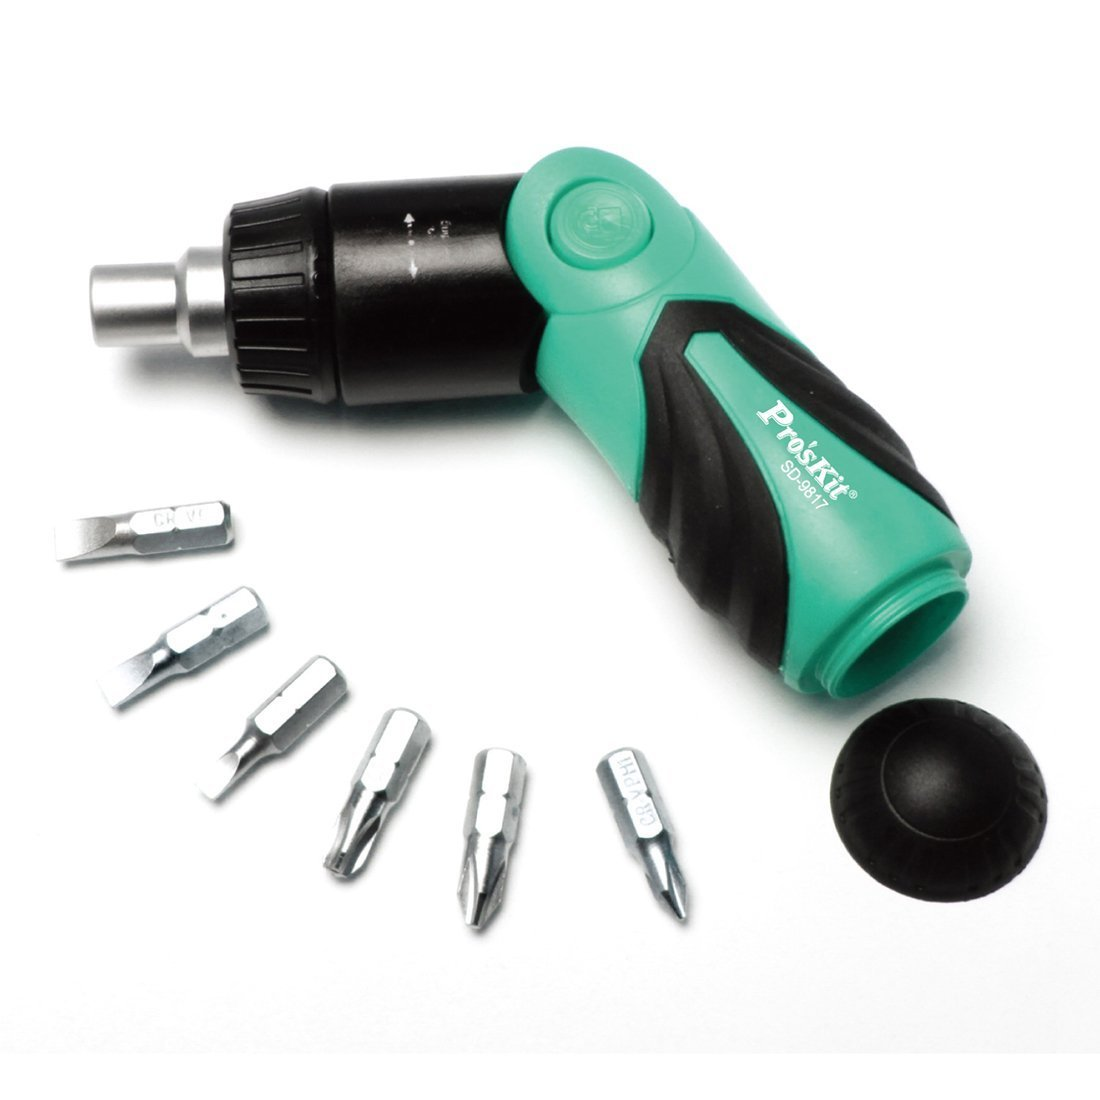 Pro'sKit Ratchet Screwdriver Set SD-9817 6 in 1 Mini Adjustable Magnetic Repair Tool Kit for Carpenter, Locksmith, Electrician, Auto Mechanic or Home DIY Repair - Including 6pcs Driver Bits